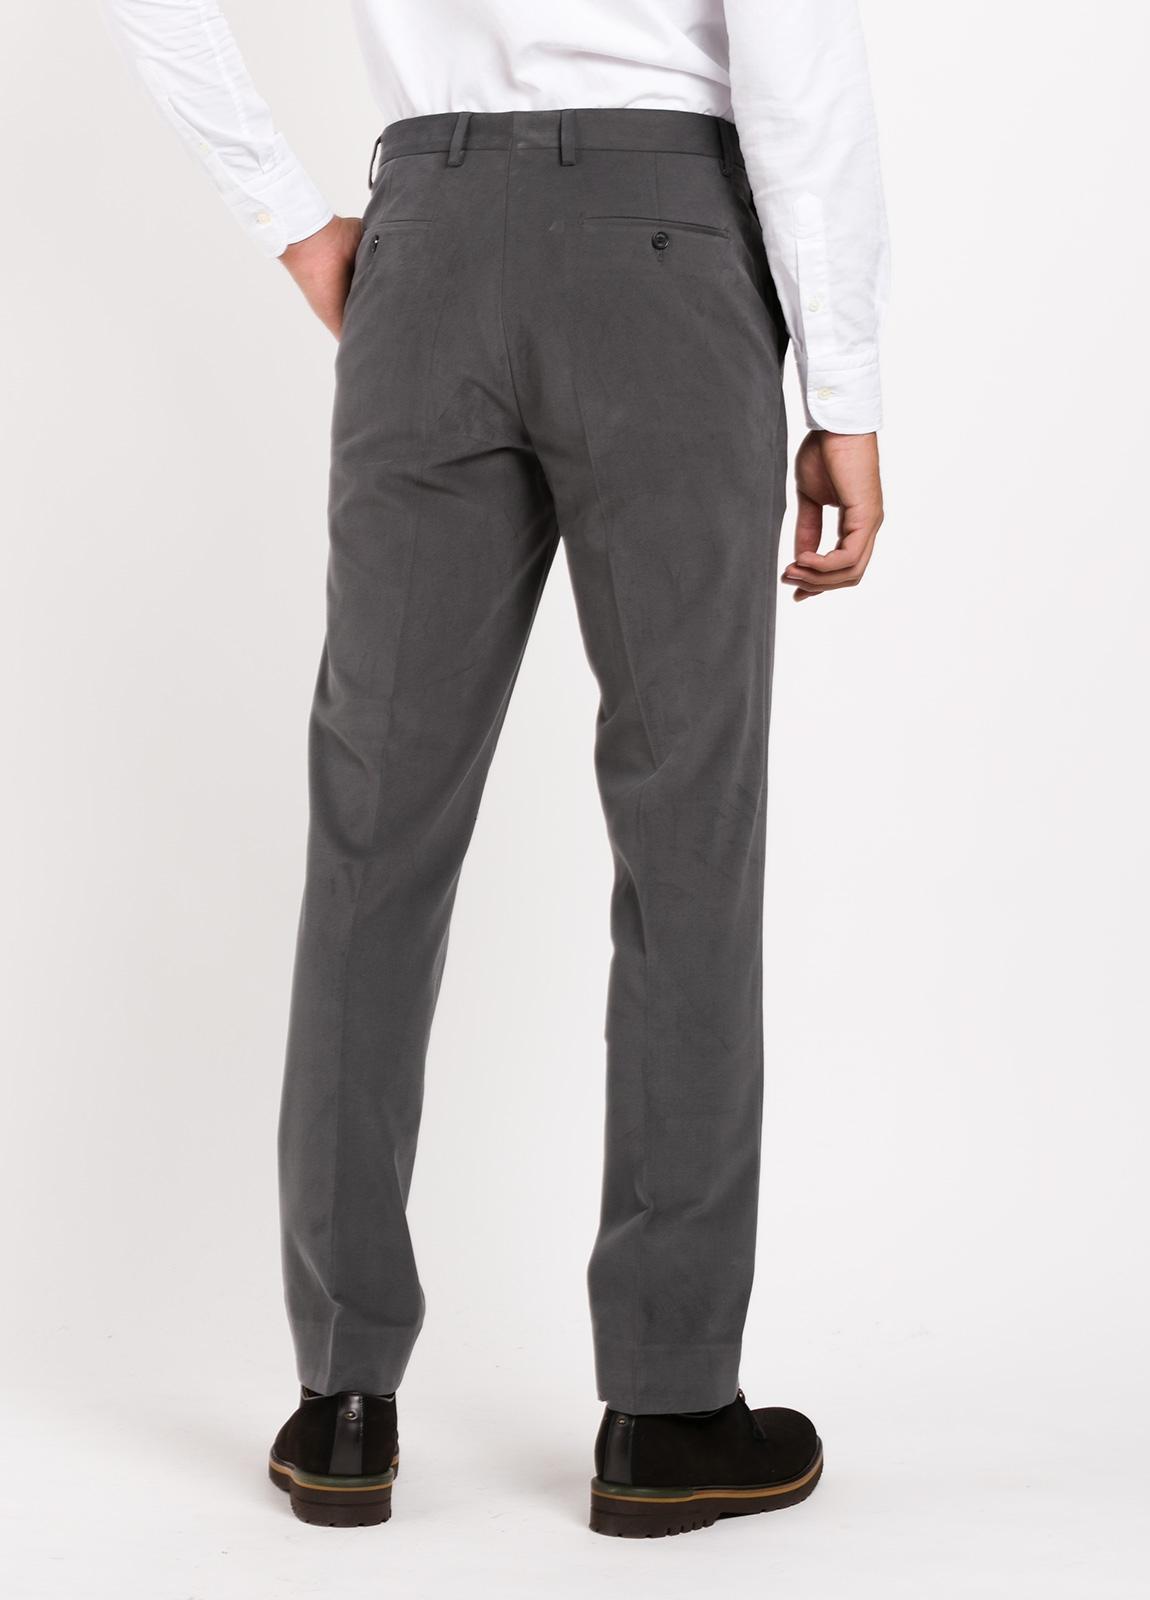 Pantalón vestir de algodón Regular Fit, color gris oscuro. 98% Algodón, 2% Ea. - Ítem3